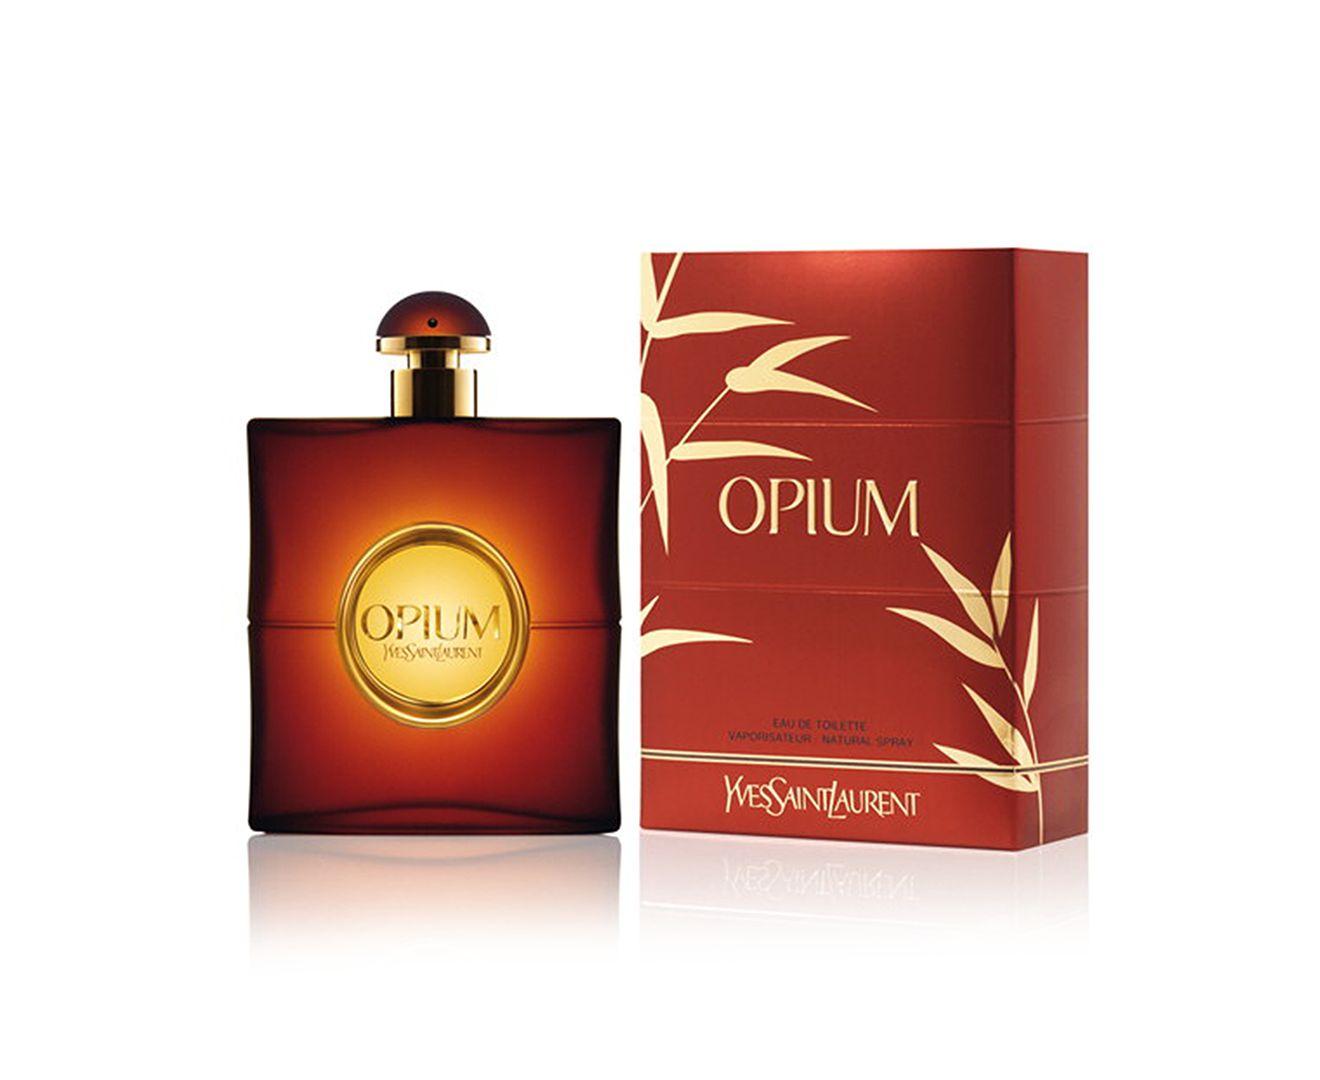 Opium Yves Saint Laurent Pret Yves Saint Laurent Opium Eau